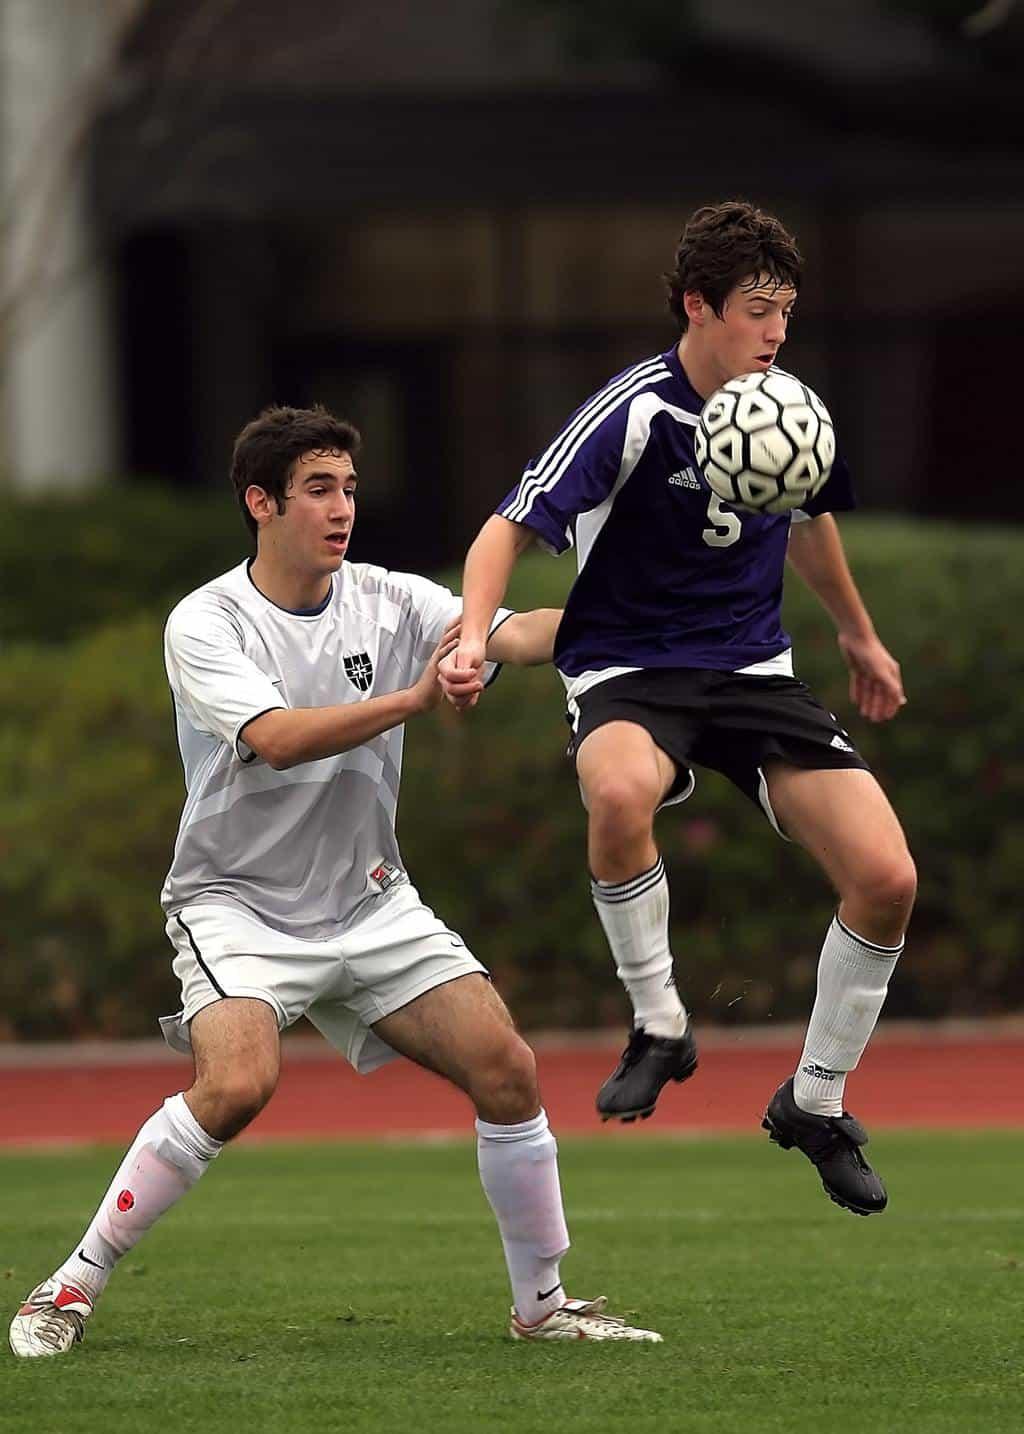 Two men playing soccer